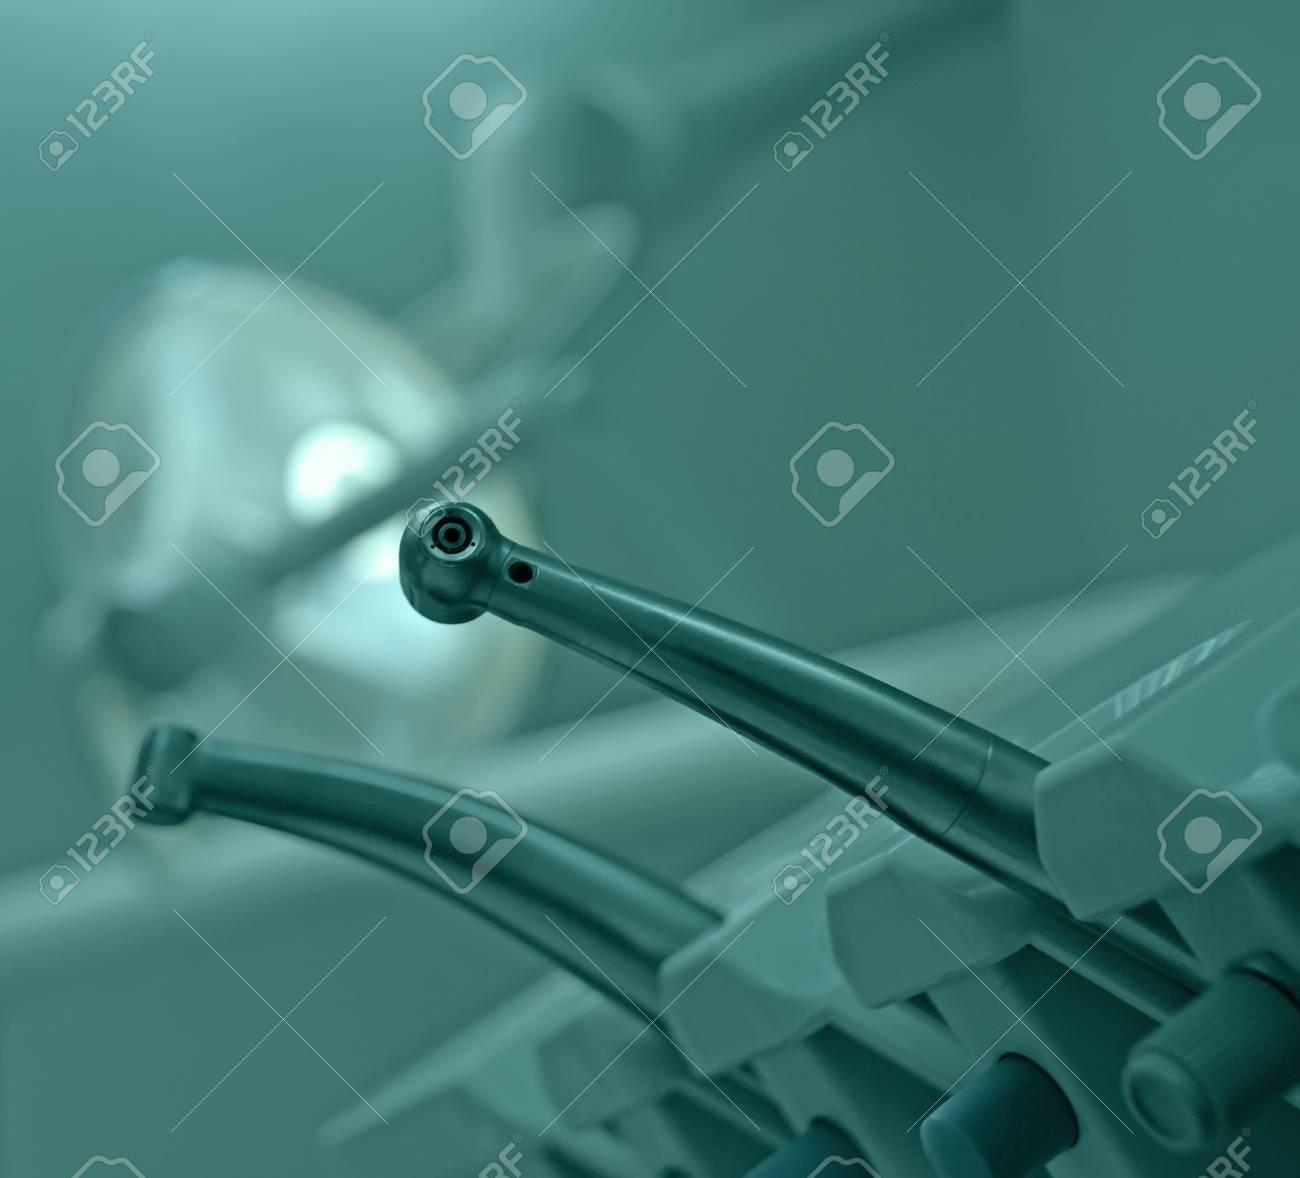 Dental work place Stock Photo - 5789181